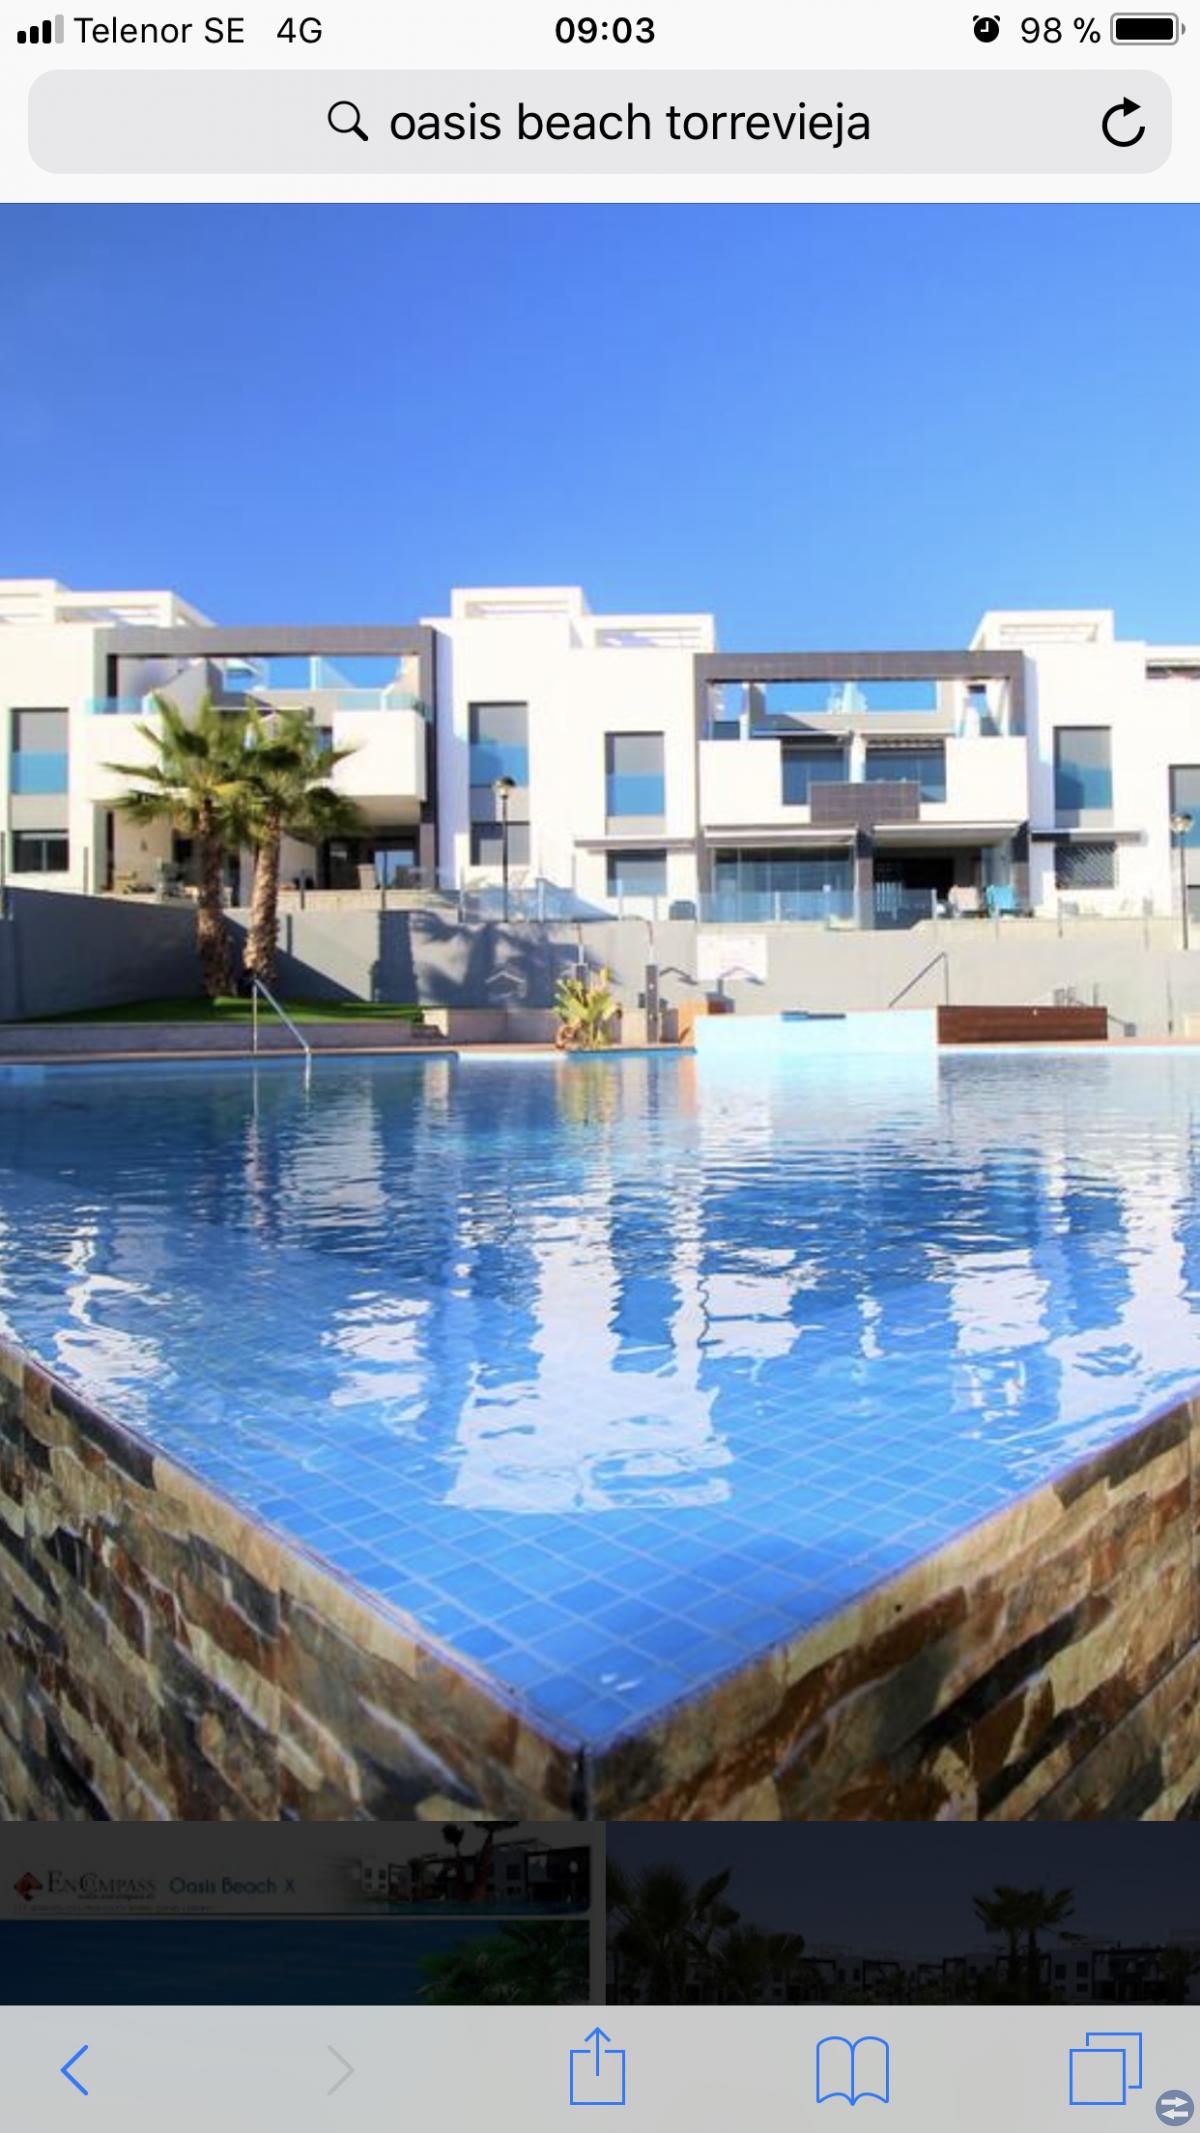 Lägenhet i Spanien/Torrevieja uthyres